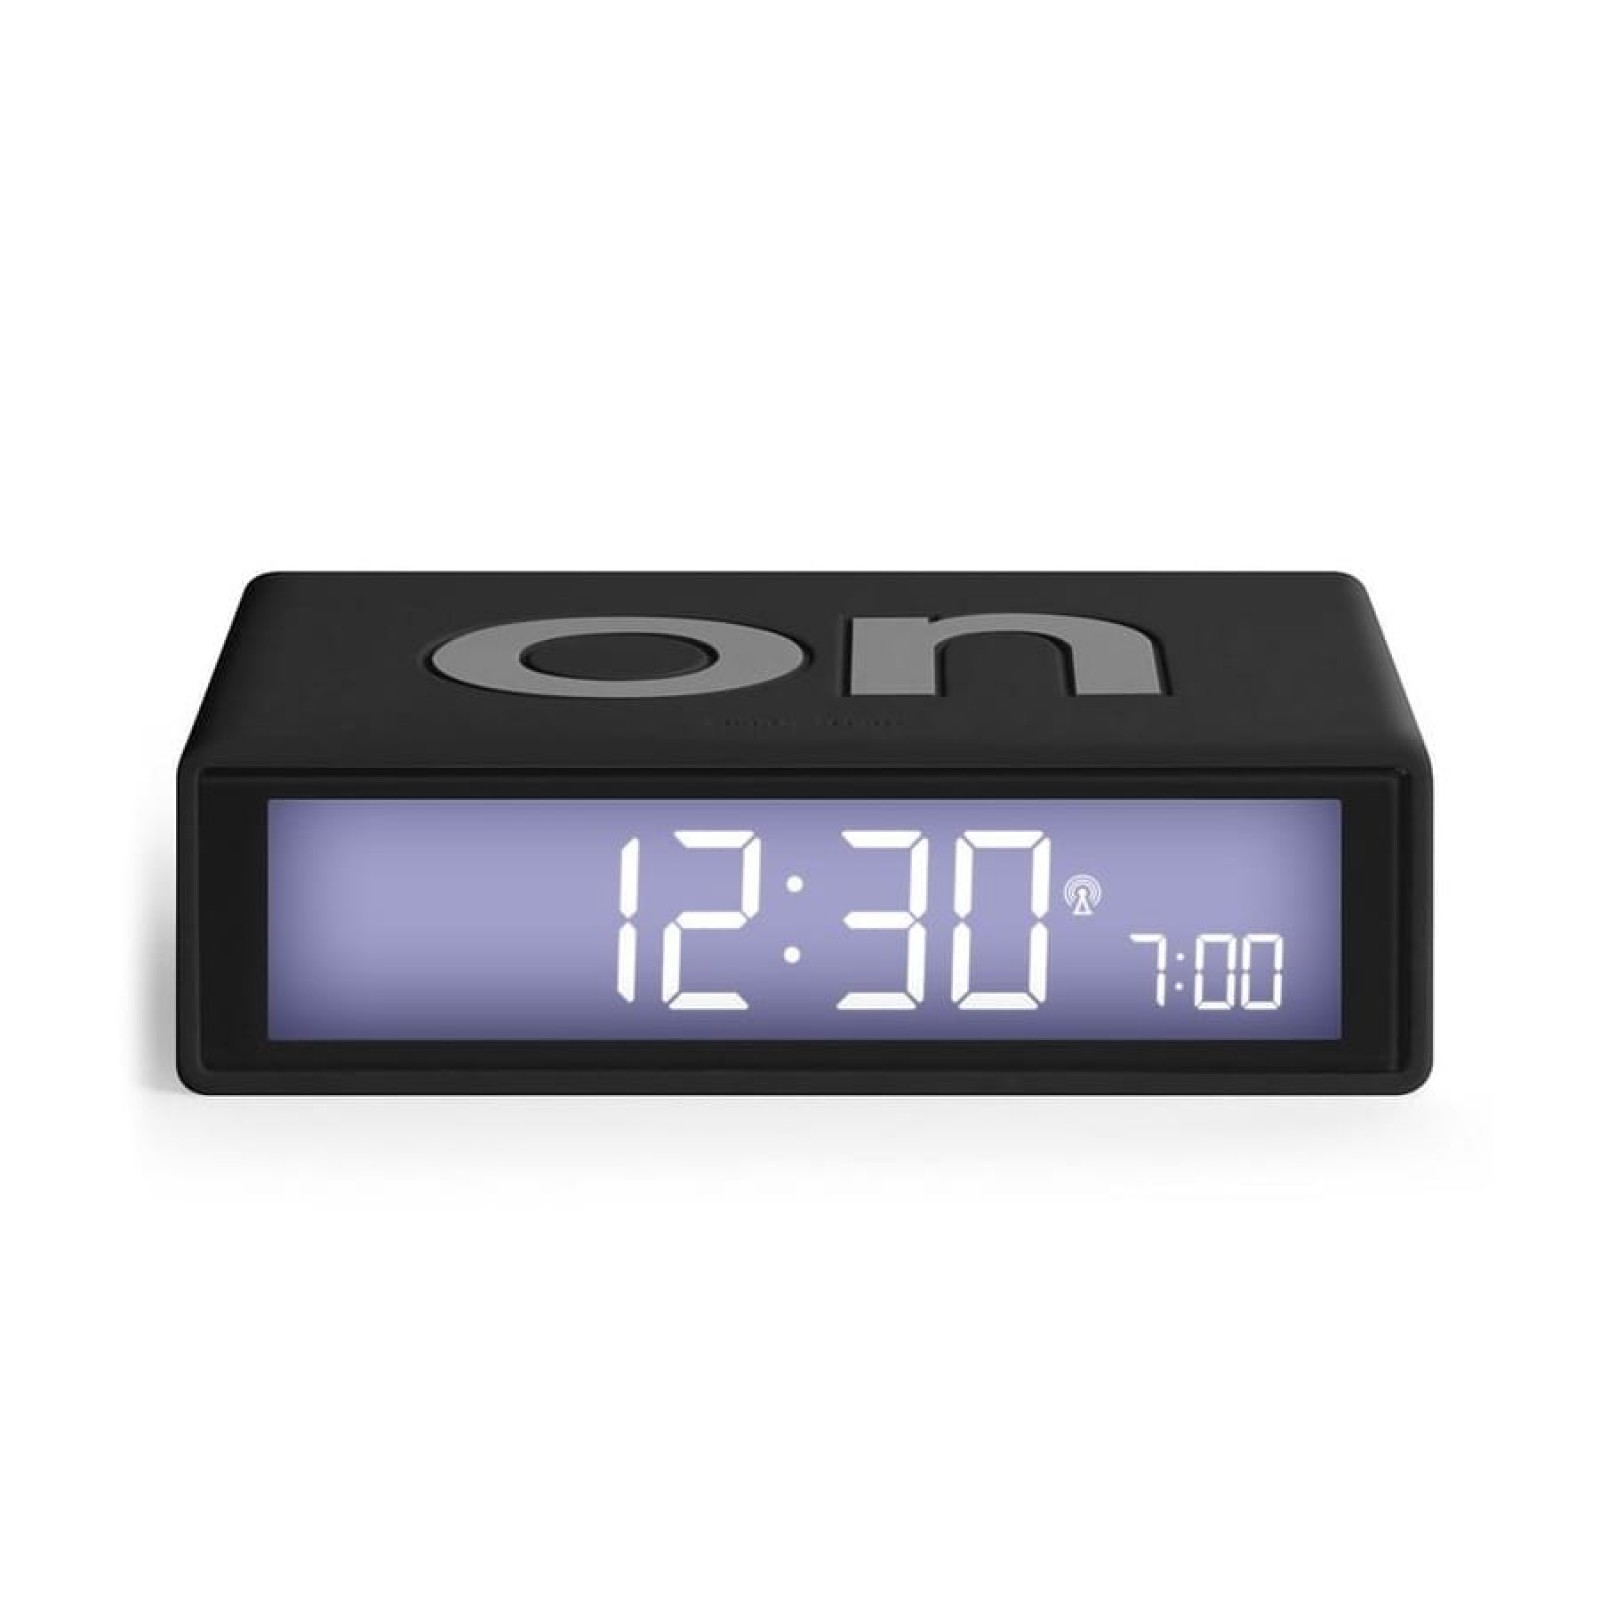 Flip + LCD Alarm Clock Black - LEXON